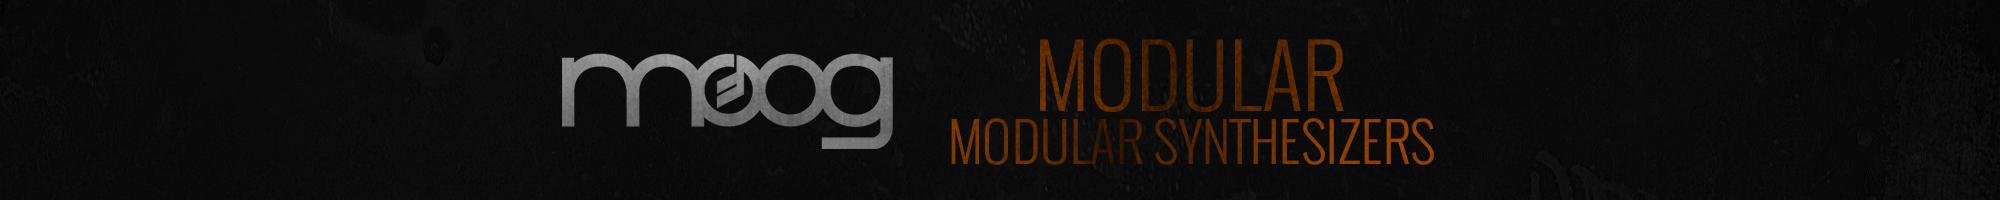 Moog Modular Synthesizers